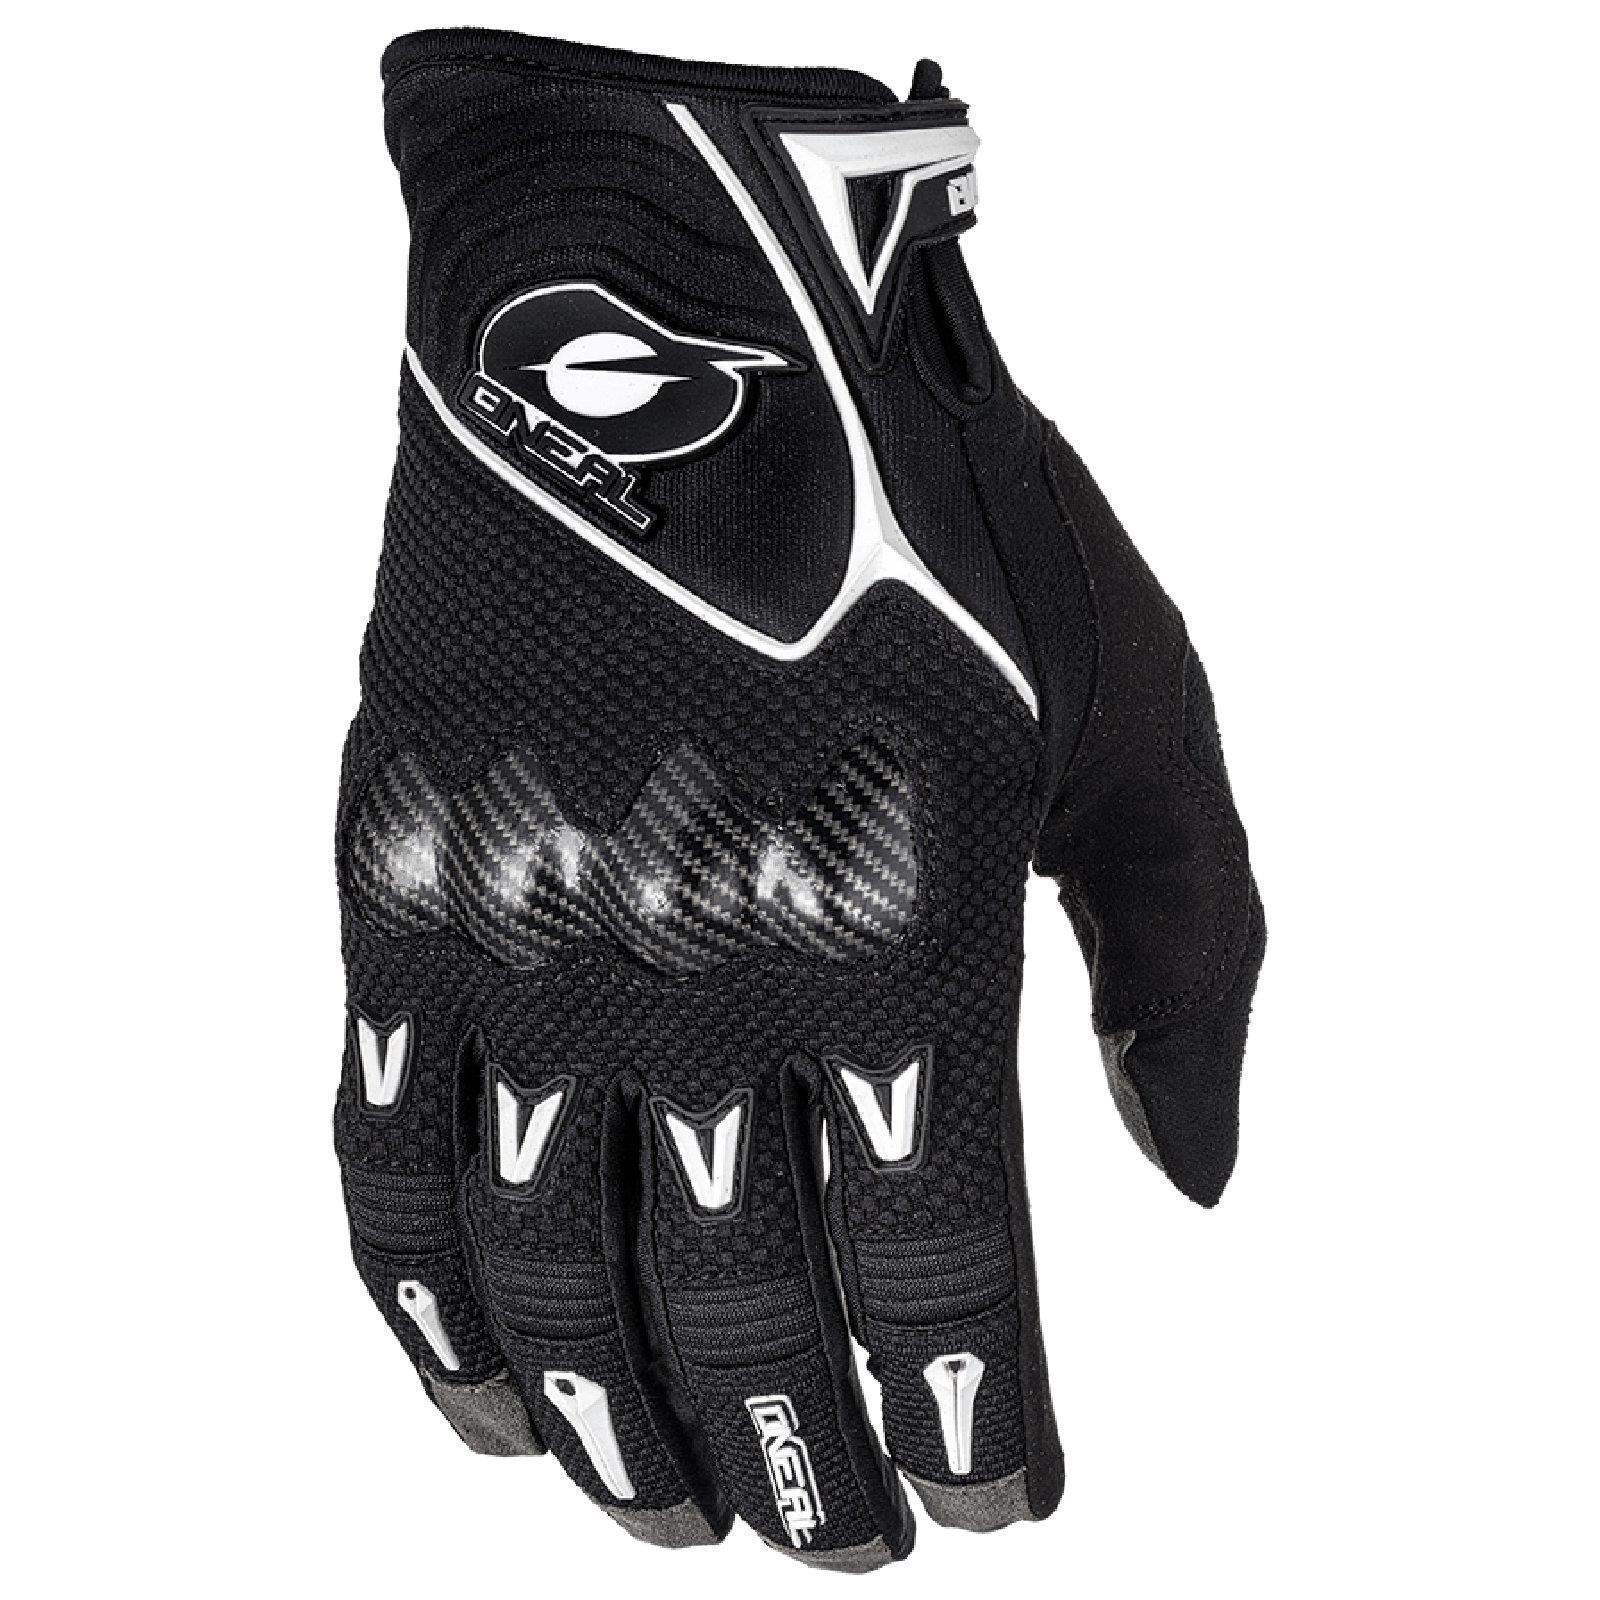 O'Neal Butch Carbon Knöchel MX Handschuhe Motocross Enduro Offroad DH Knöchel Carbon Schutz MTB 2a5841